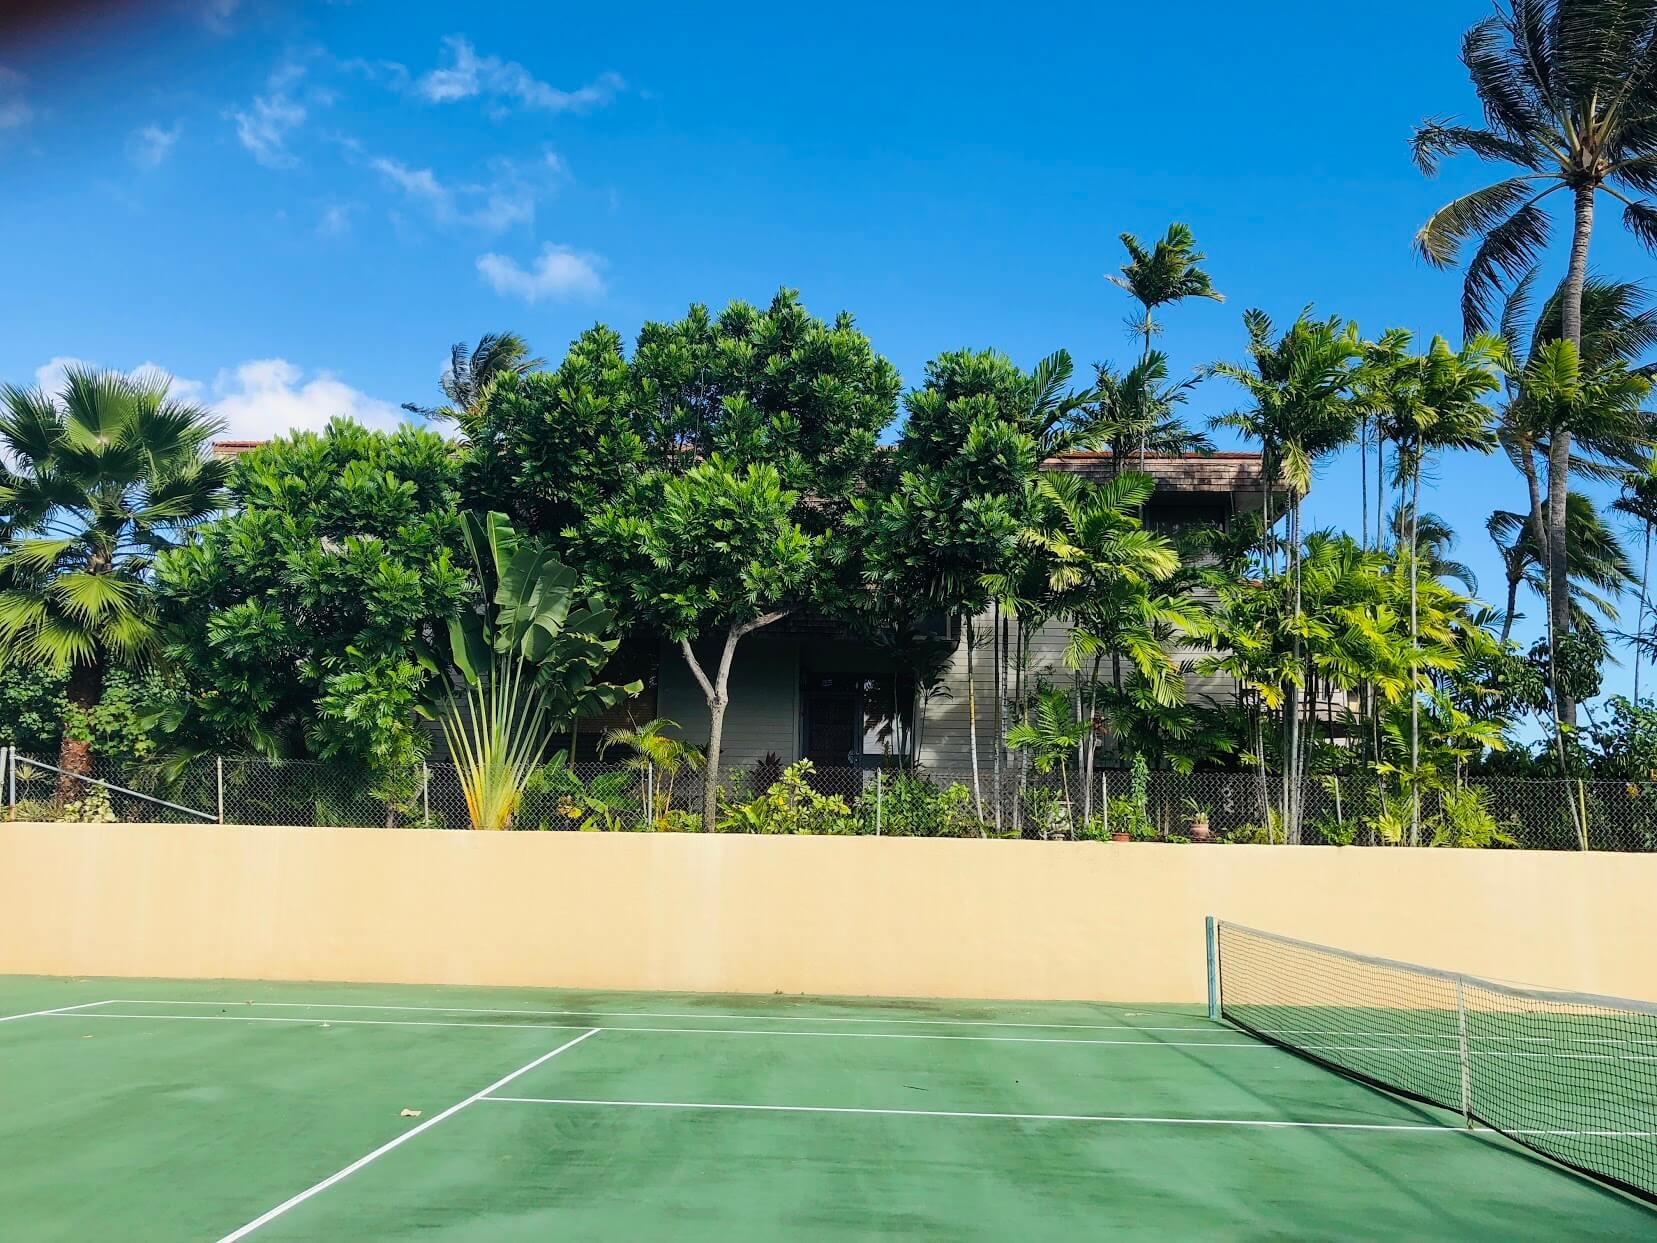 Napua Pointのテニス